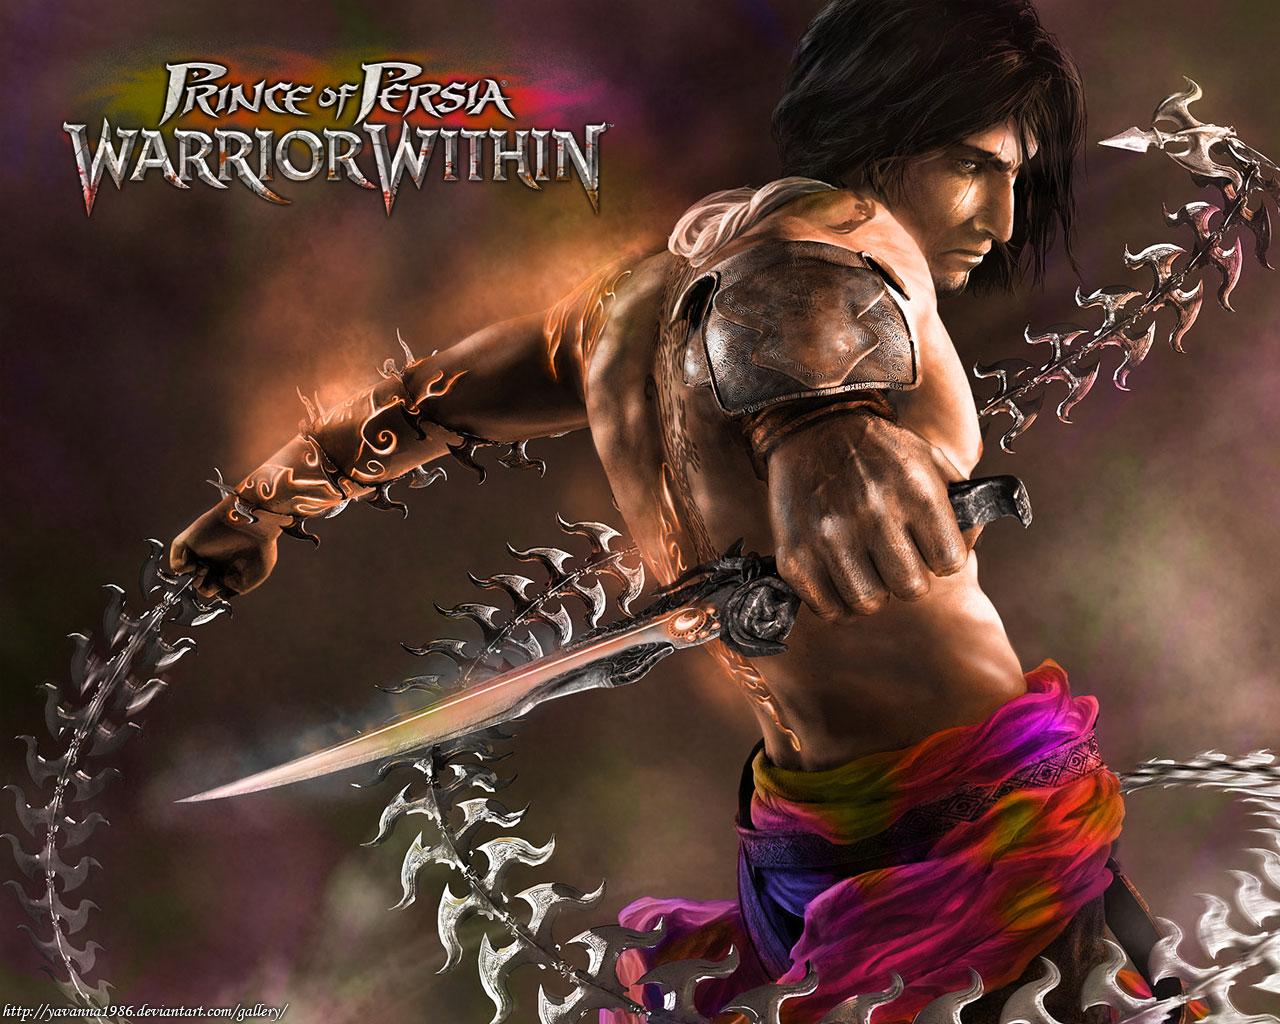 http://4.bp.blogspot.com/-FSsDO2l5XOM/TeoEckjVDSI/AAAAAAAAAJ8/35HIeaW7Hfg/s1600/Prince_of_Persia___Wallpaper.jpg